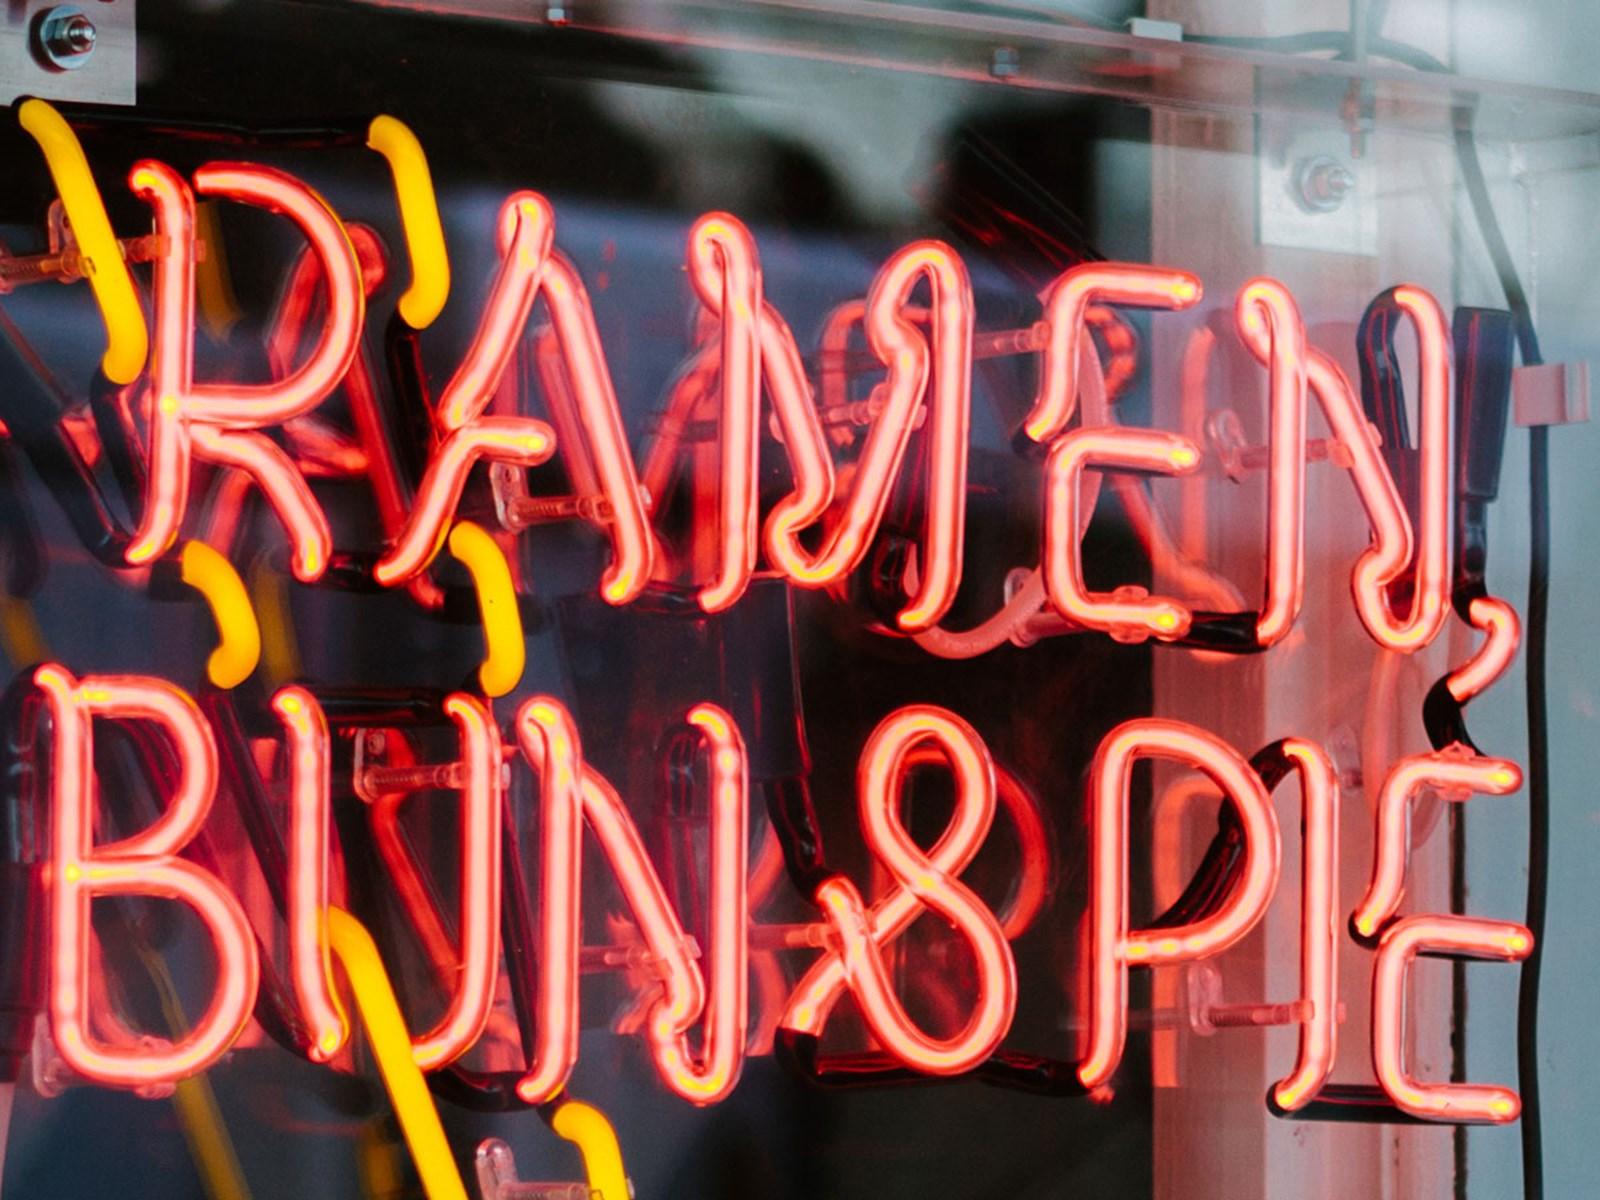 Shop Ramen, Collingwood, Melbourne, Victoria, Australia. Photo: Roberto Seba